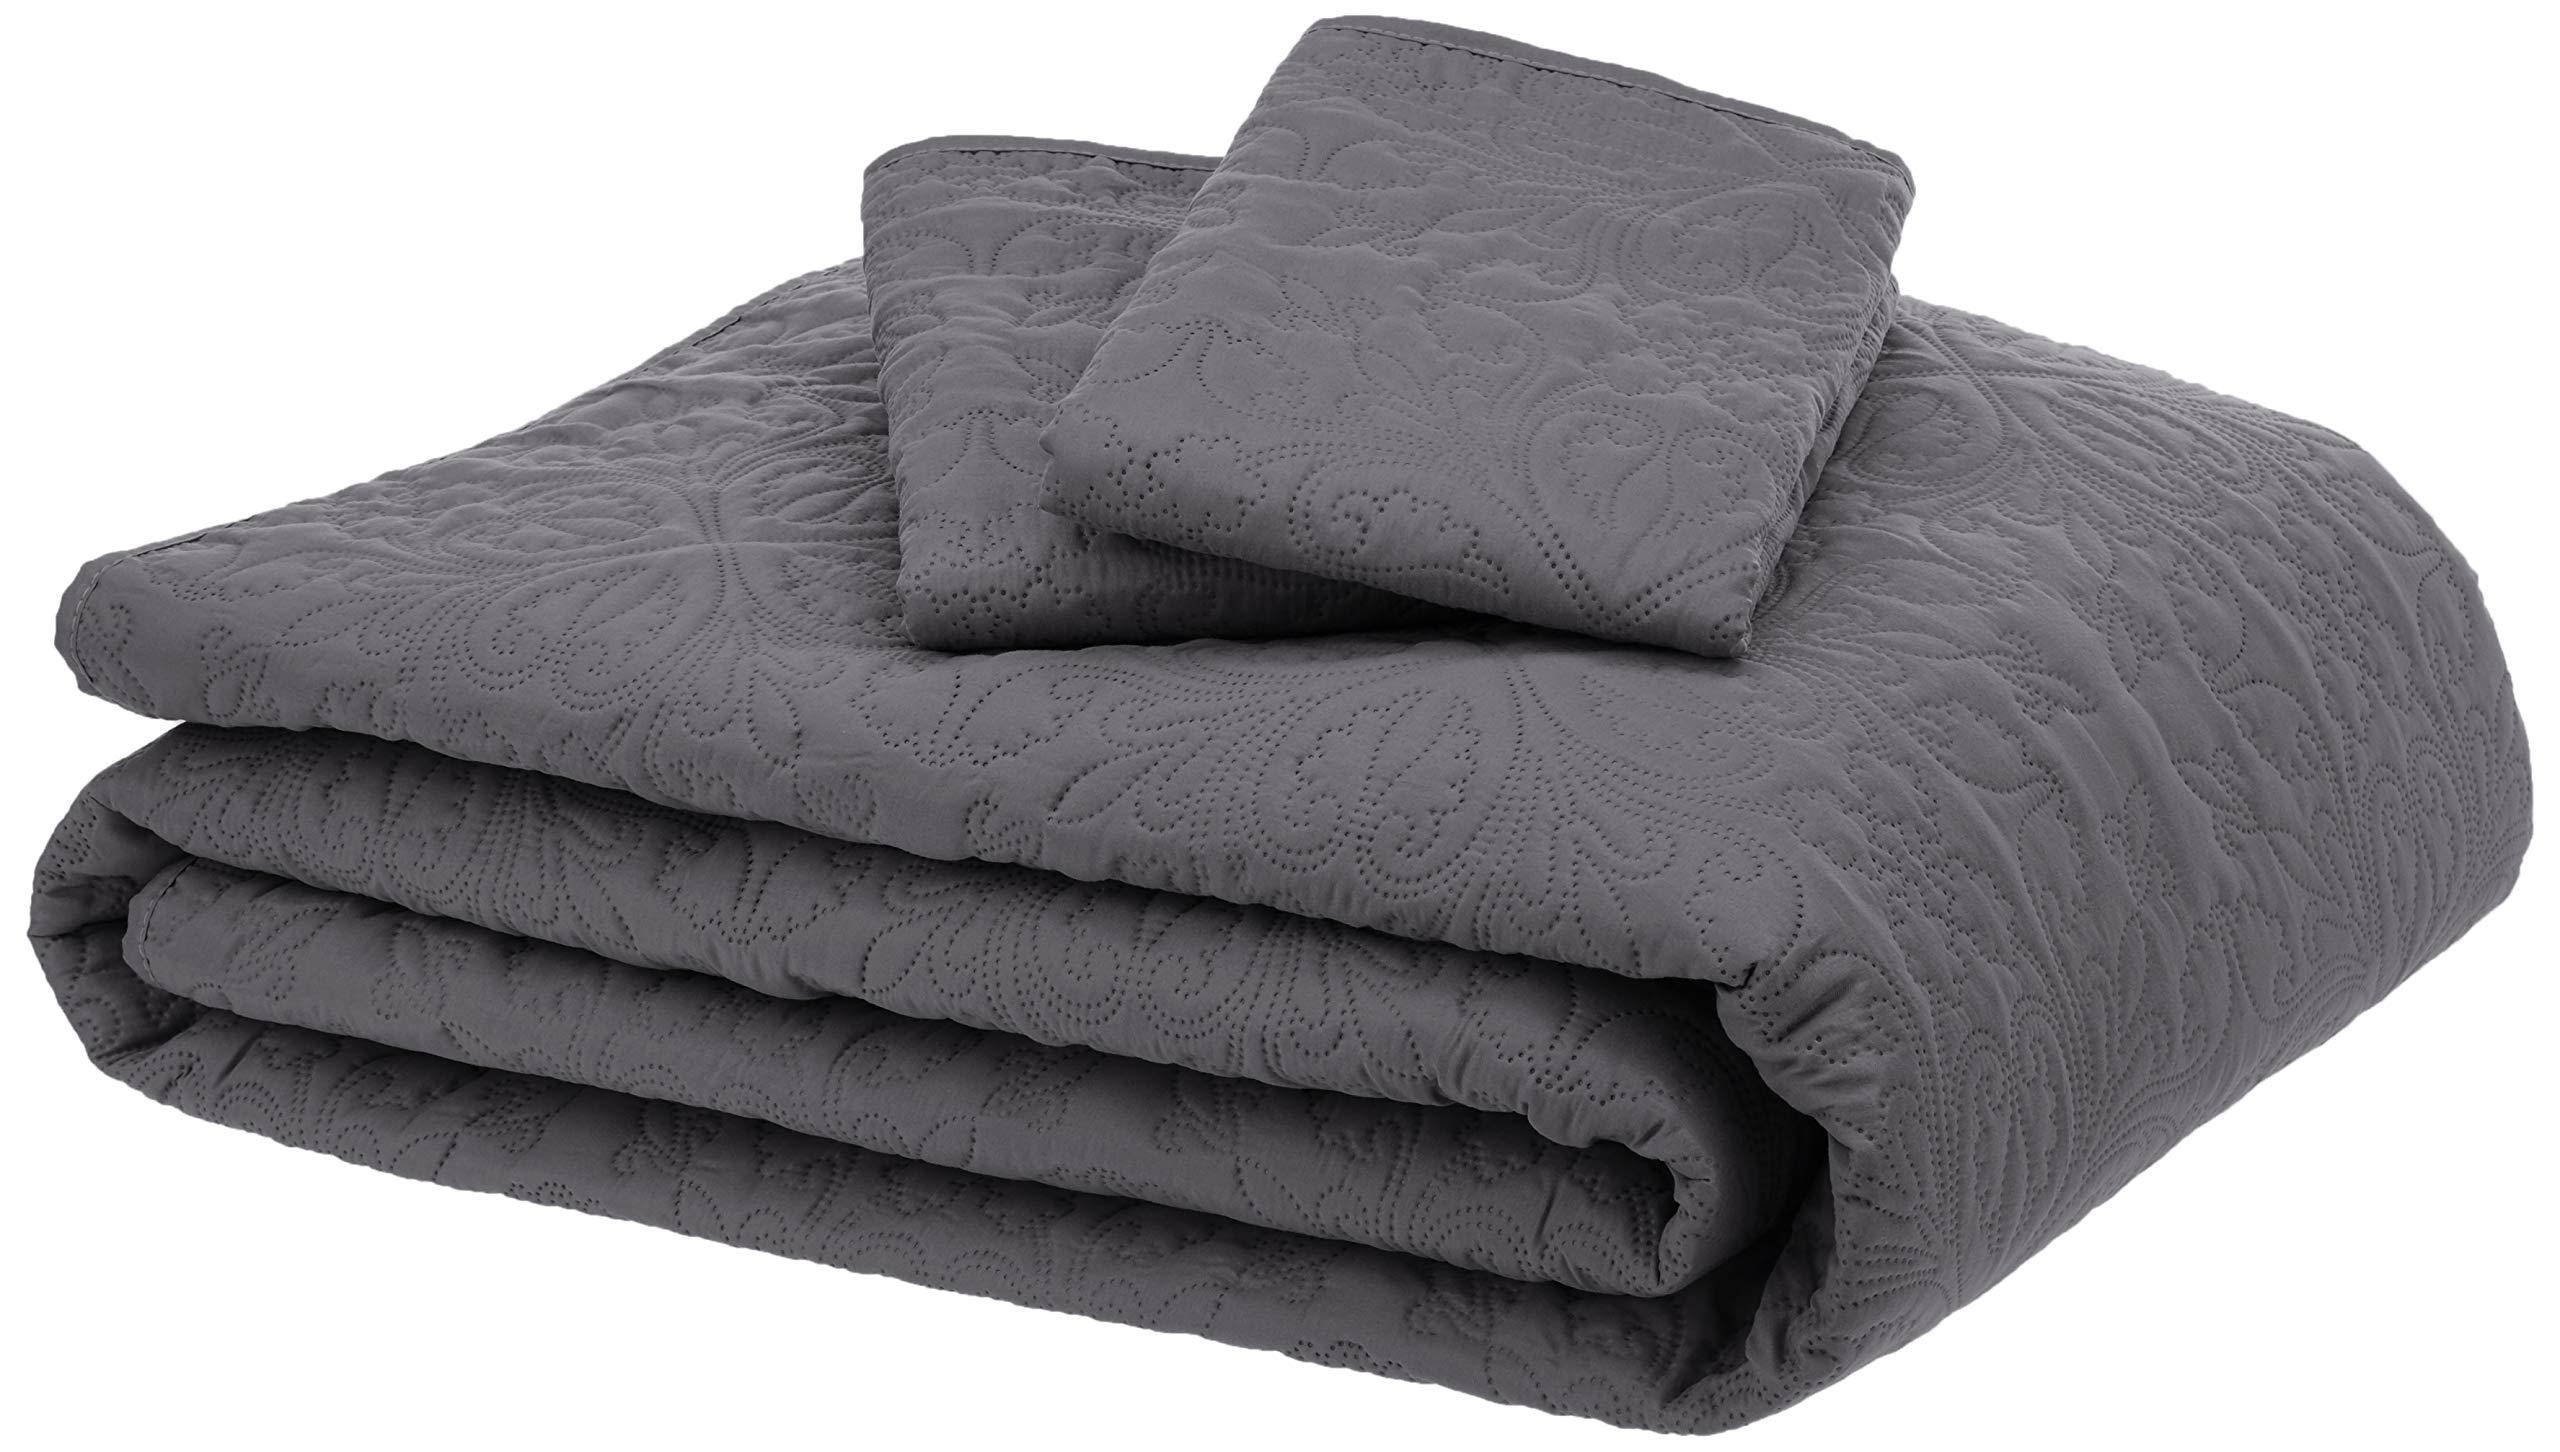 AmazonBasics Oversized Quilt Coverlet Bed Set - King, Dark Grey Floral